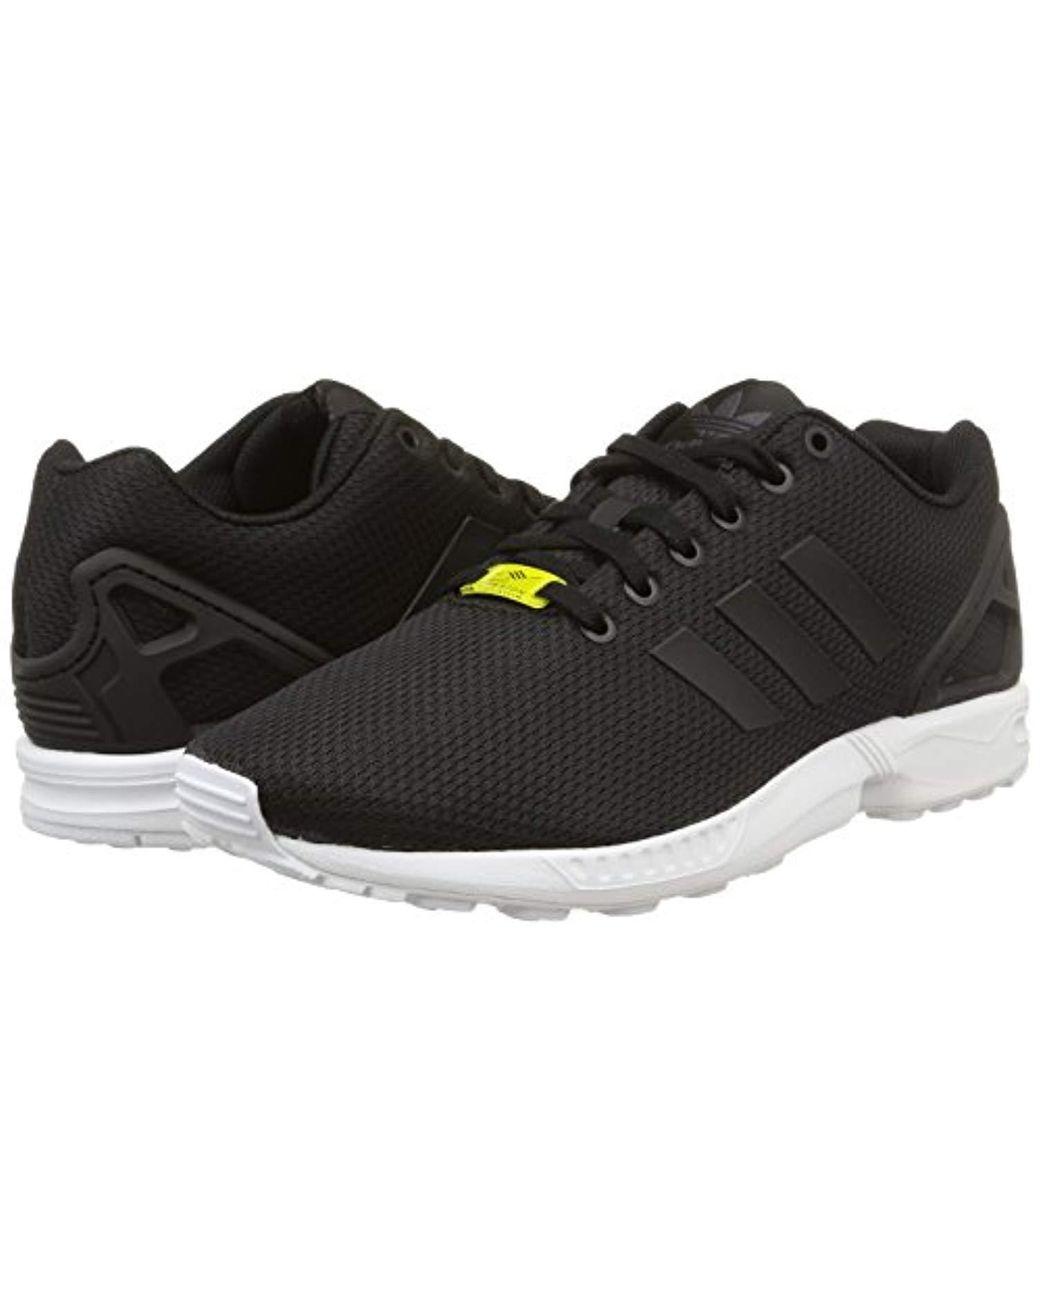 size 40 3e6df bac36 adidas. Zx Flux Women s Shoes (trainers) ...